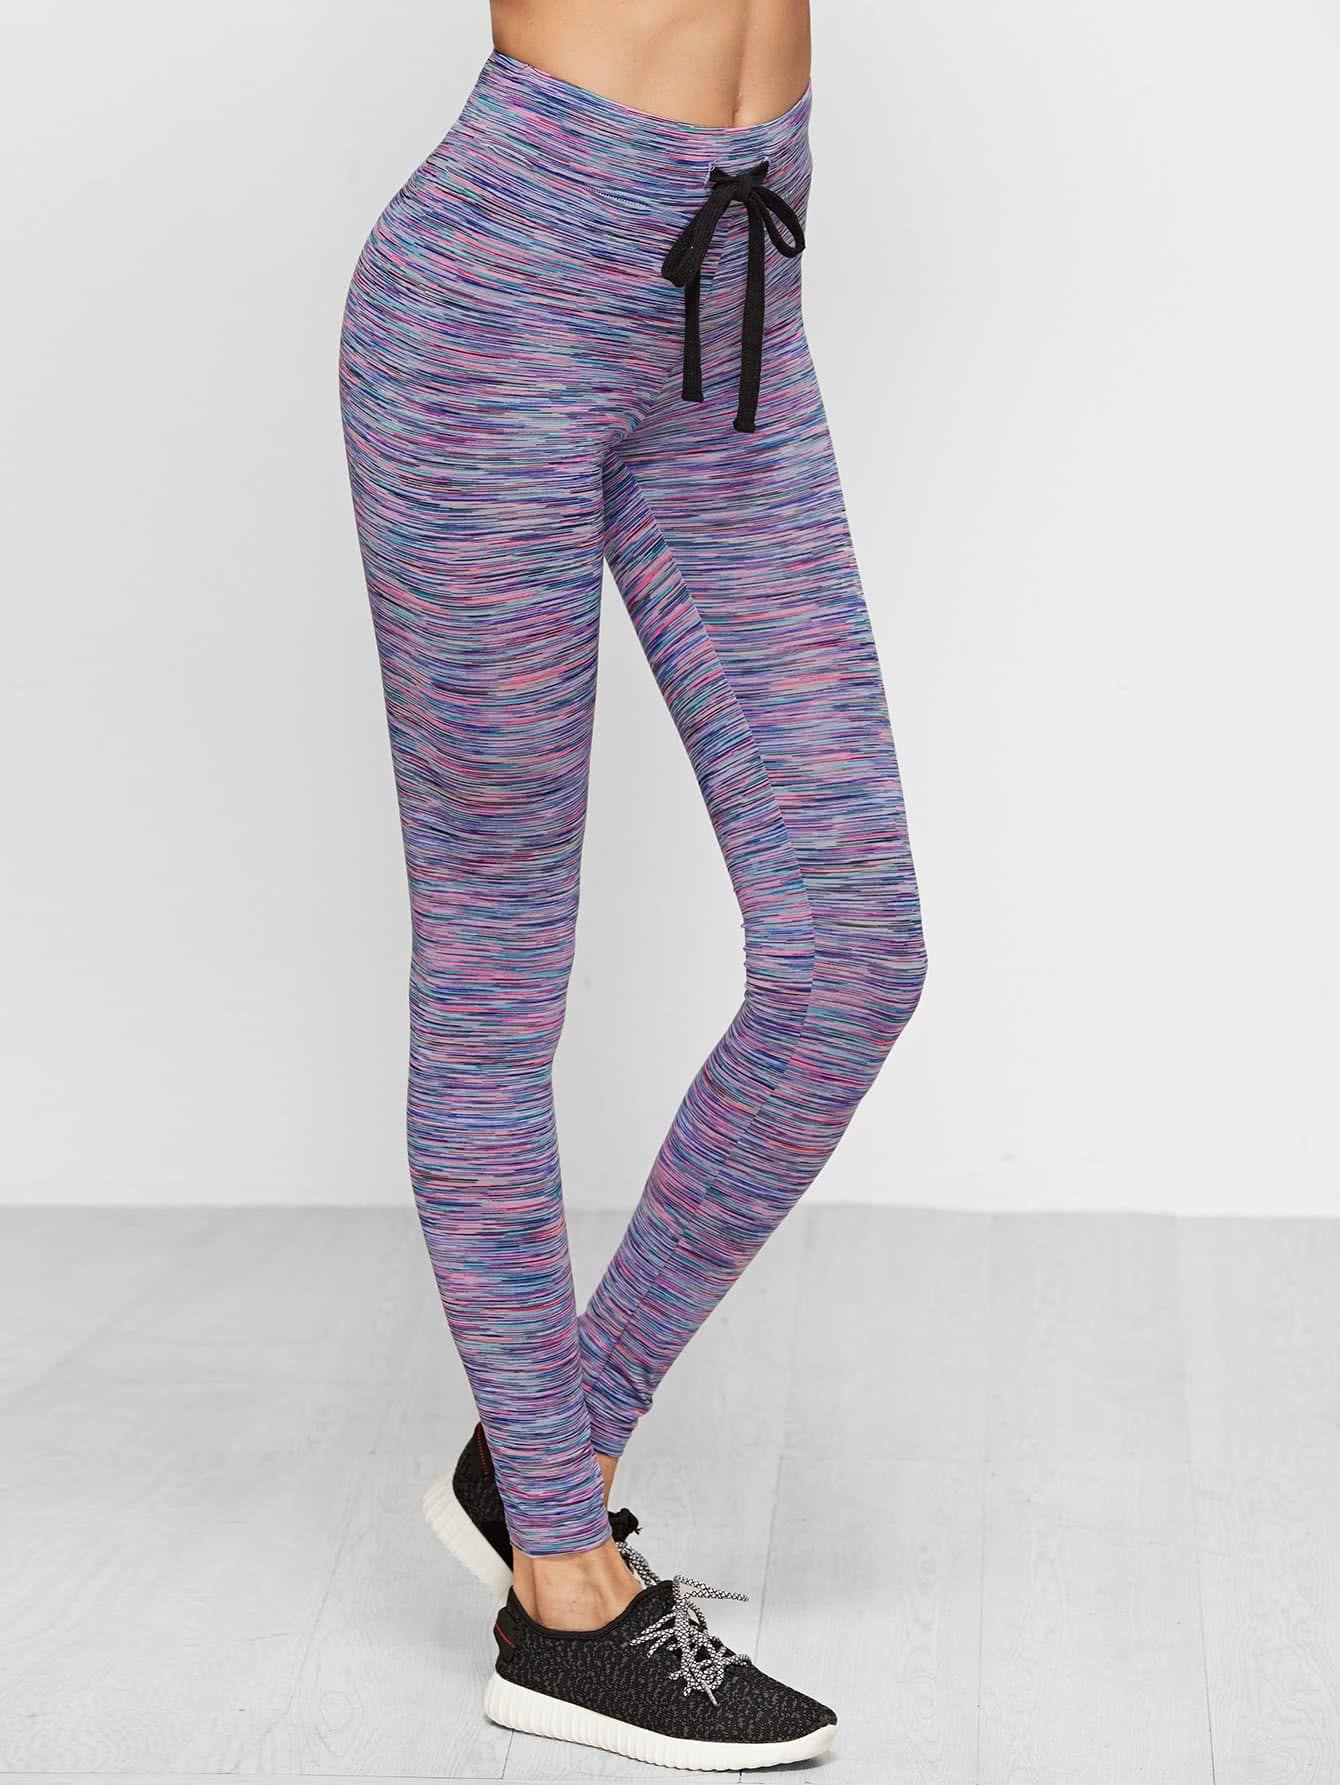 dd18ba6c74e Women Sporty Regular Multicolor Crop Length Space Dye Drawstring Waist  Leggings